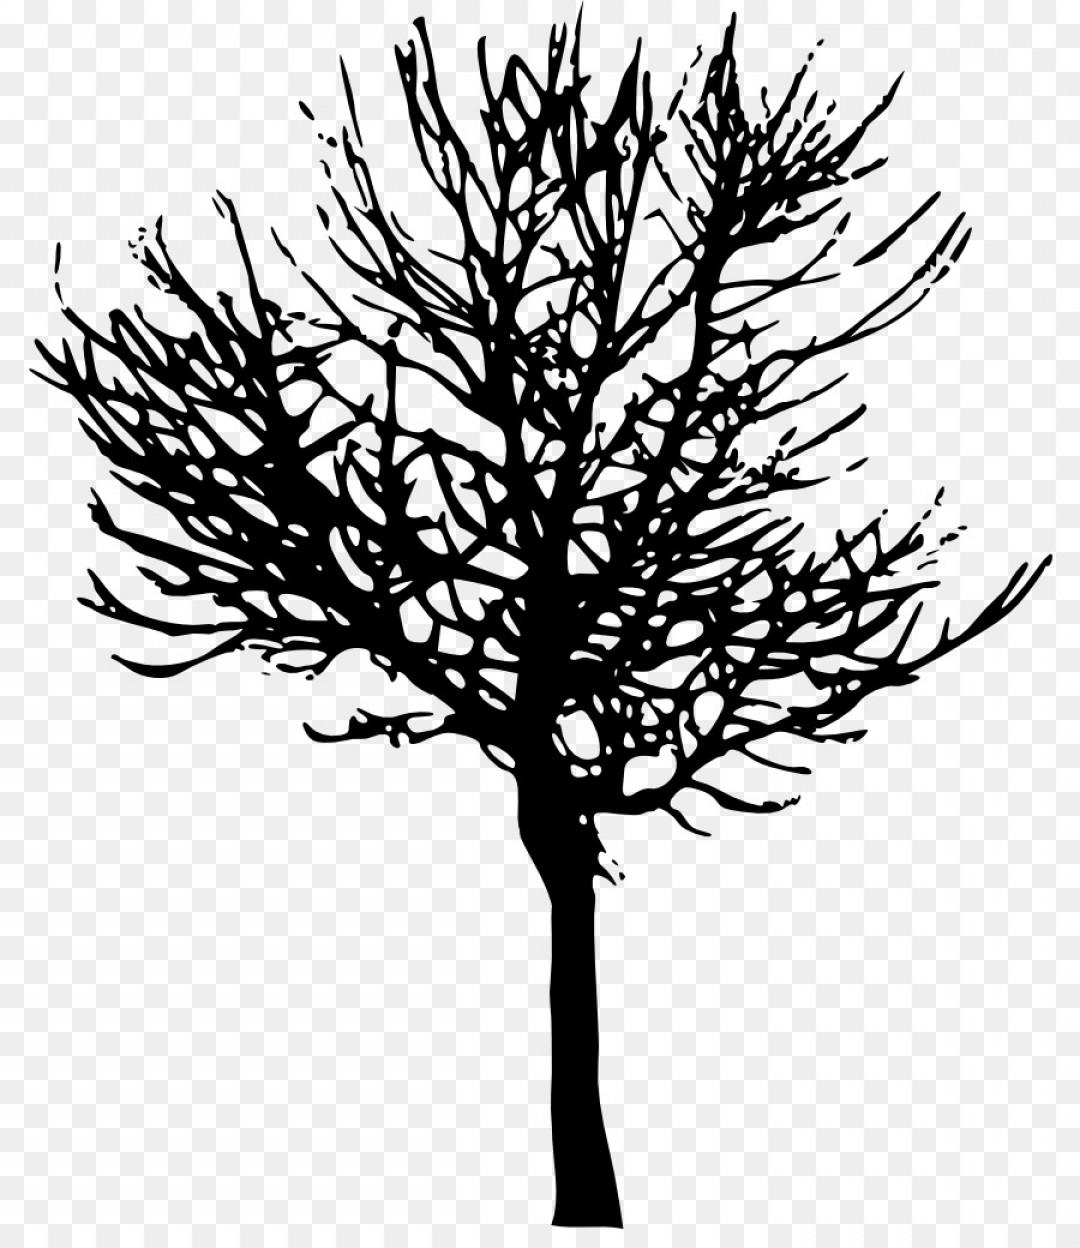 1080x1248 Png Tree Branch Desktop Wallpaper Clip Art Tree Vector Orangiausa